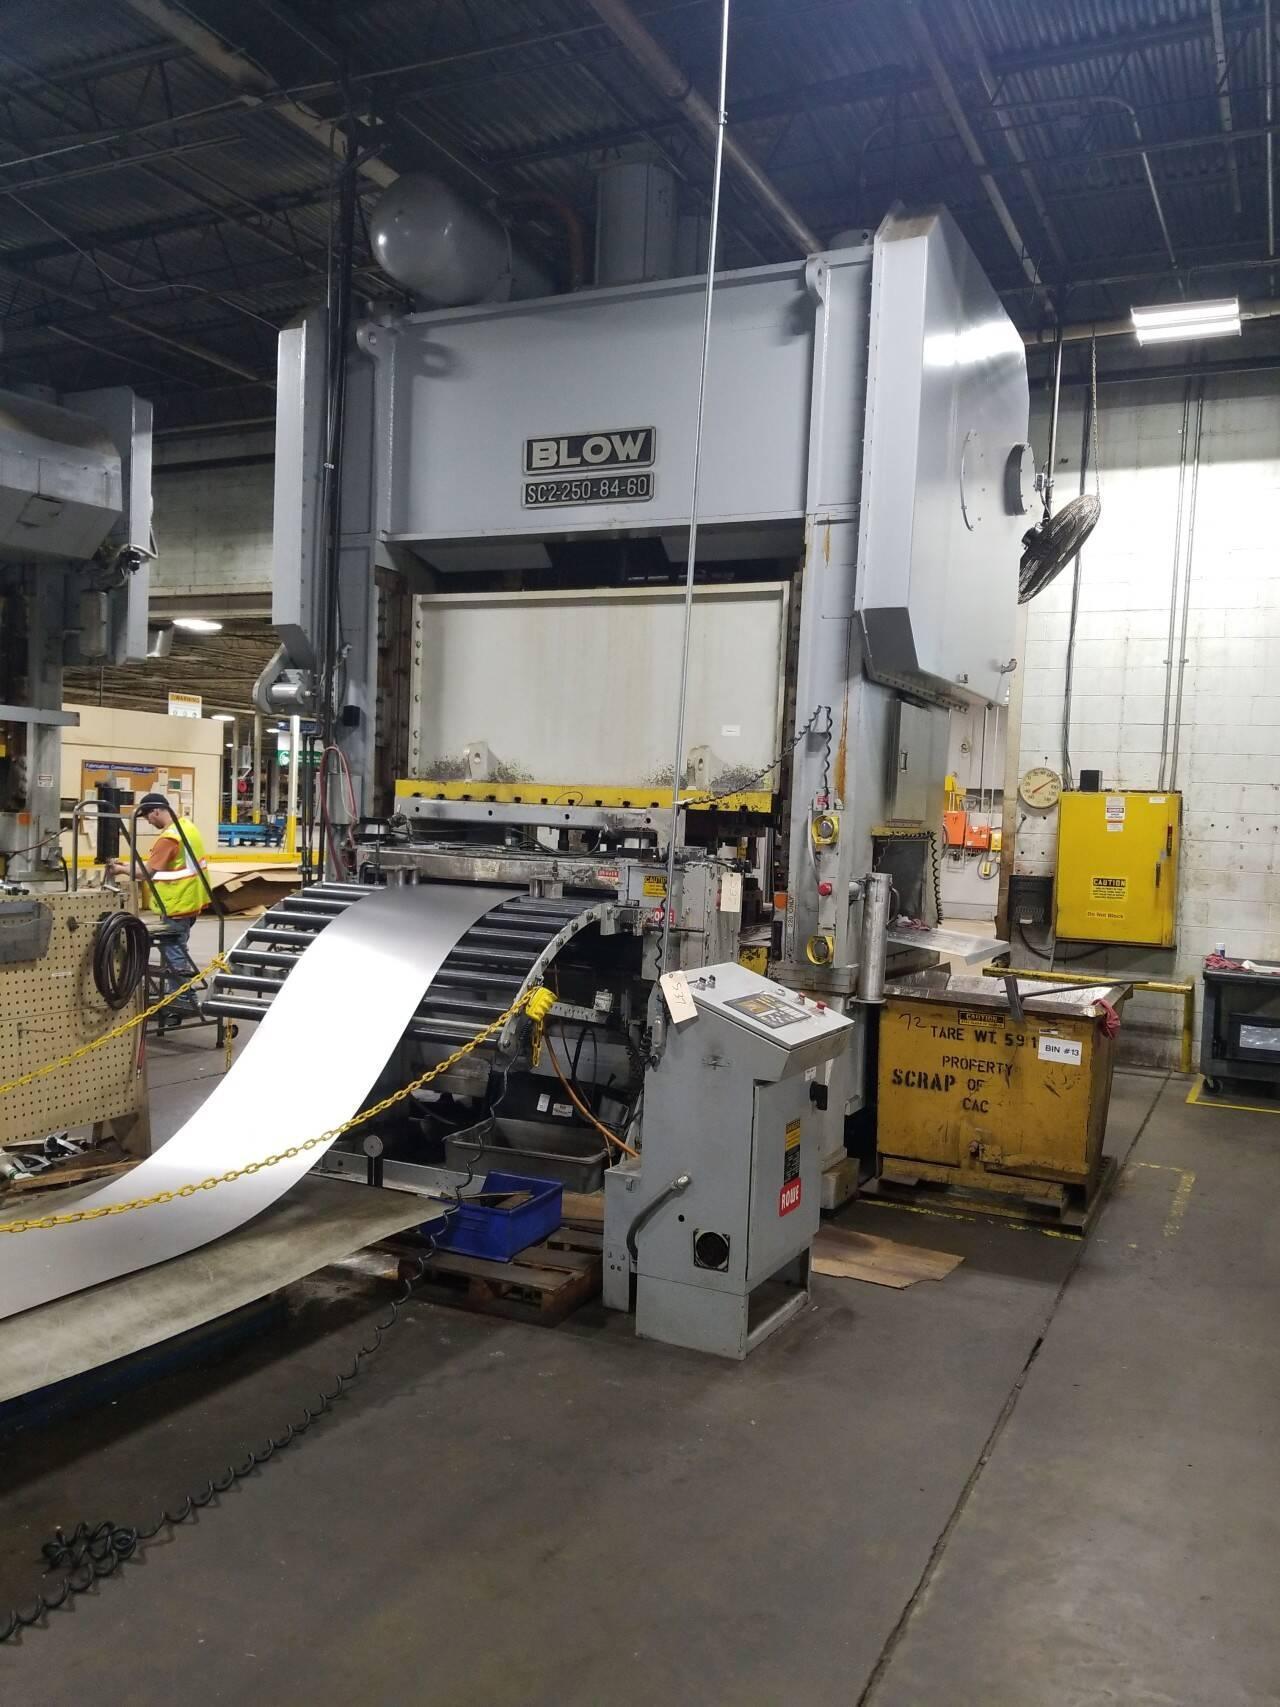 250 ton Blow SC2-250-84-60 Straight Side Mechanical Press